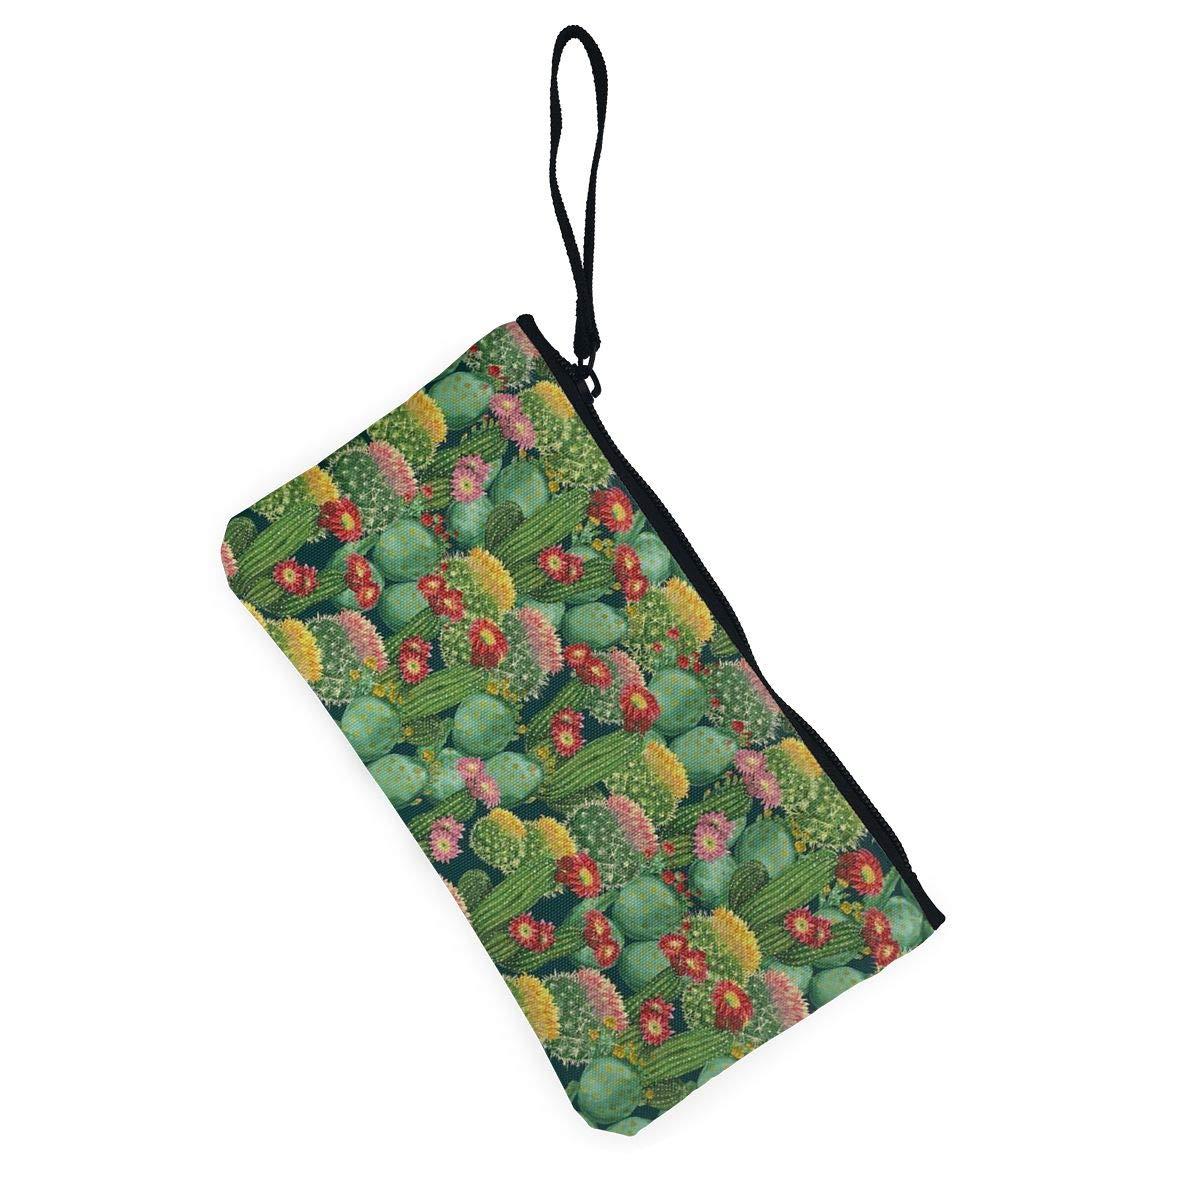 YUANSHAN Garden Cactus Flowers Unisex Canvas Coin Purse Change Cash Bag Zipper Small Purse Wallets with Handle